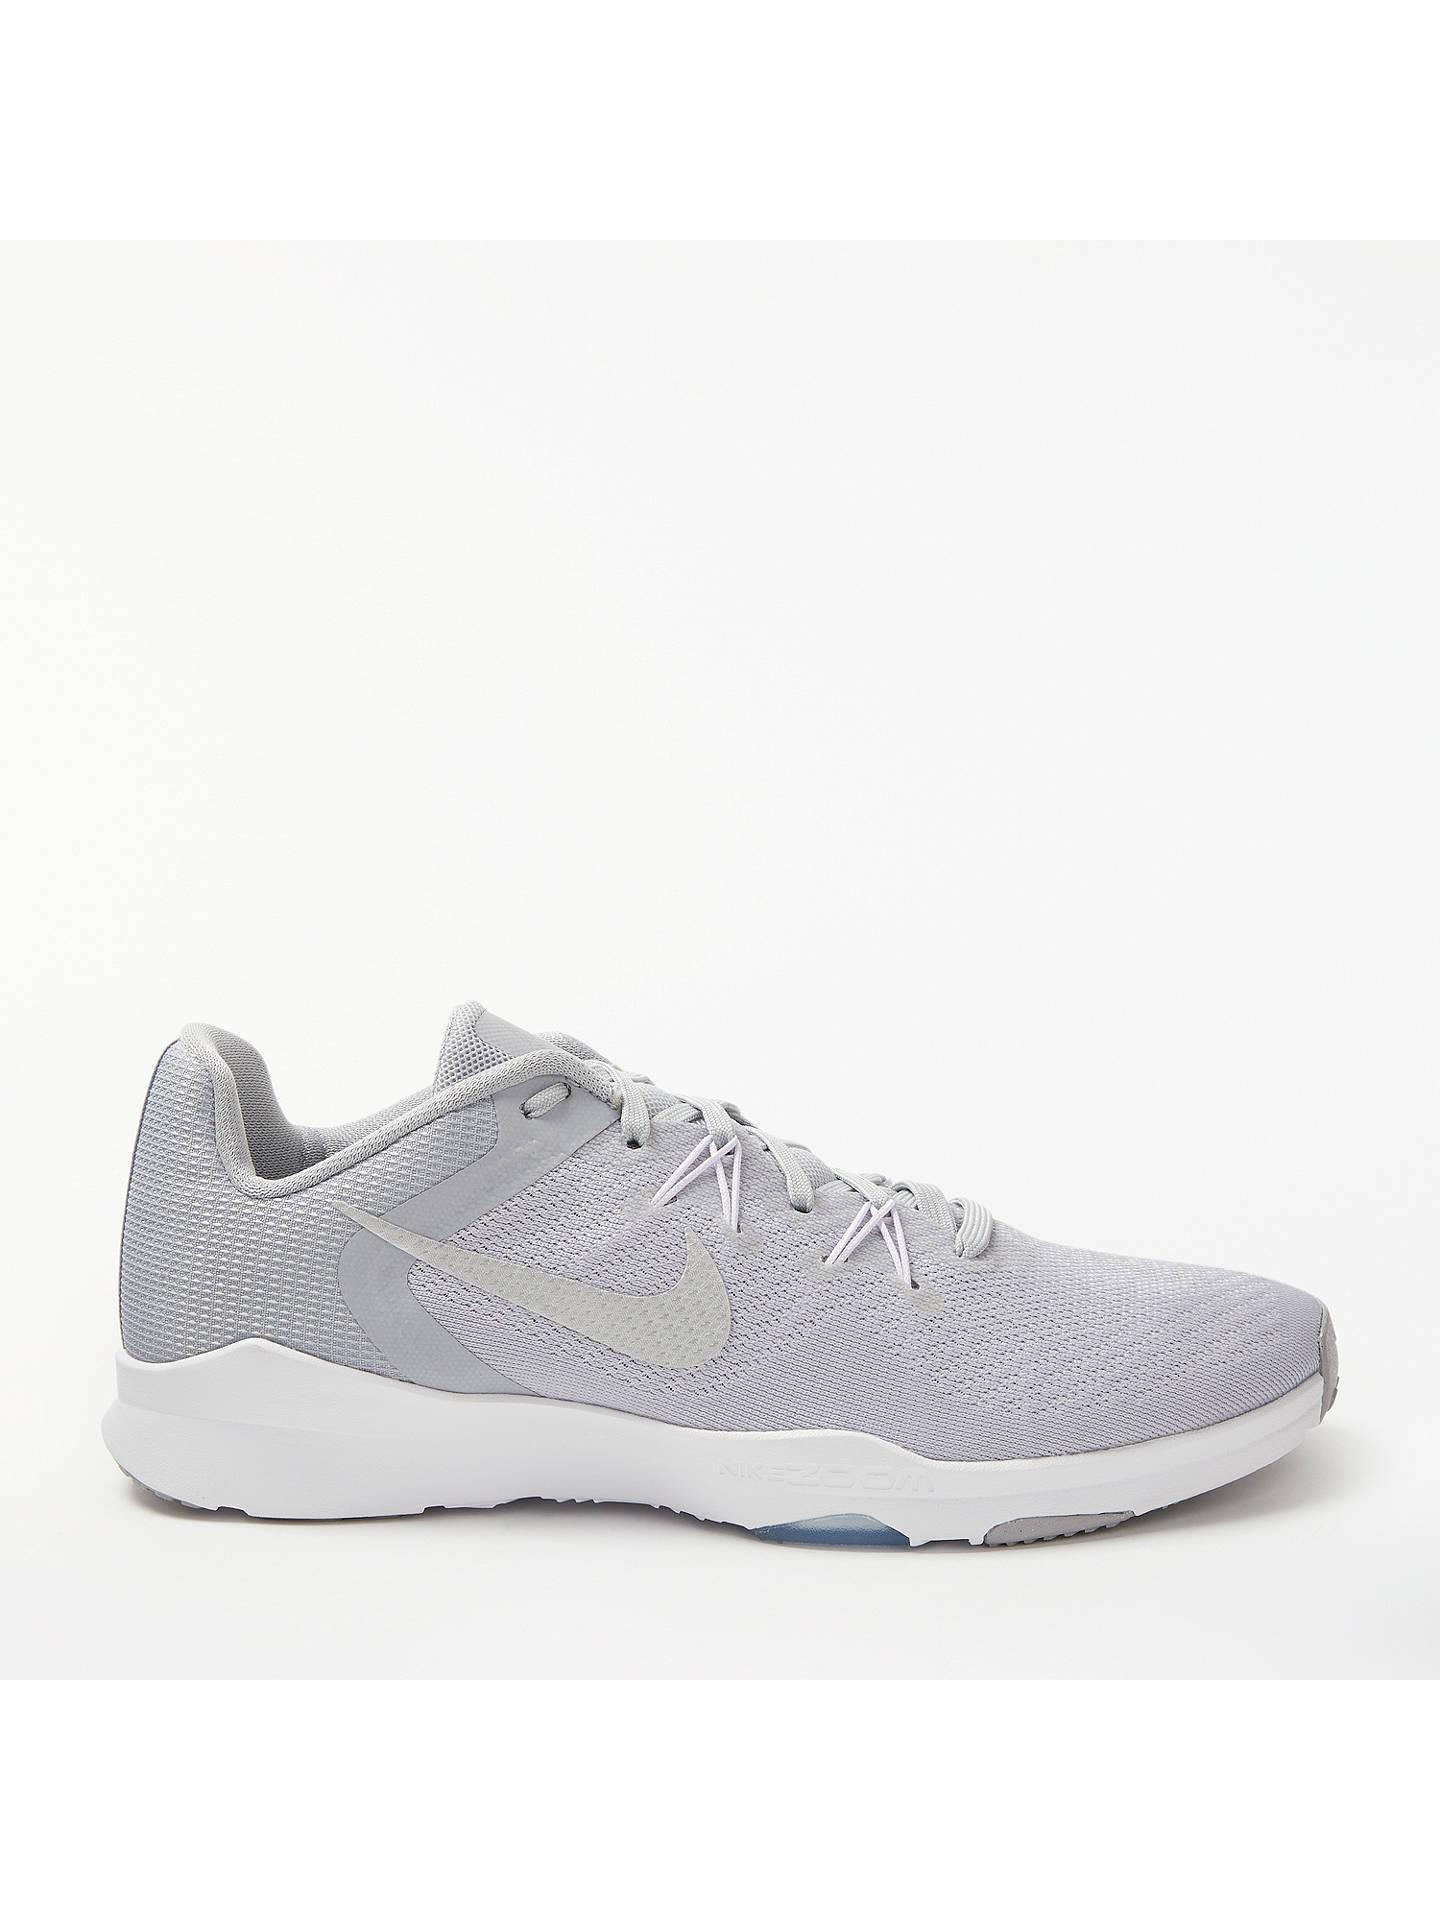 0967875e3bff Buy Nike Zoom Condition TR 2 Women s Training Shoe